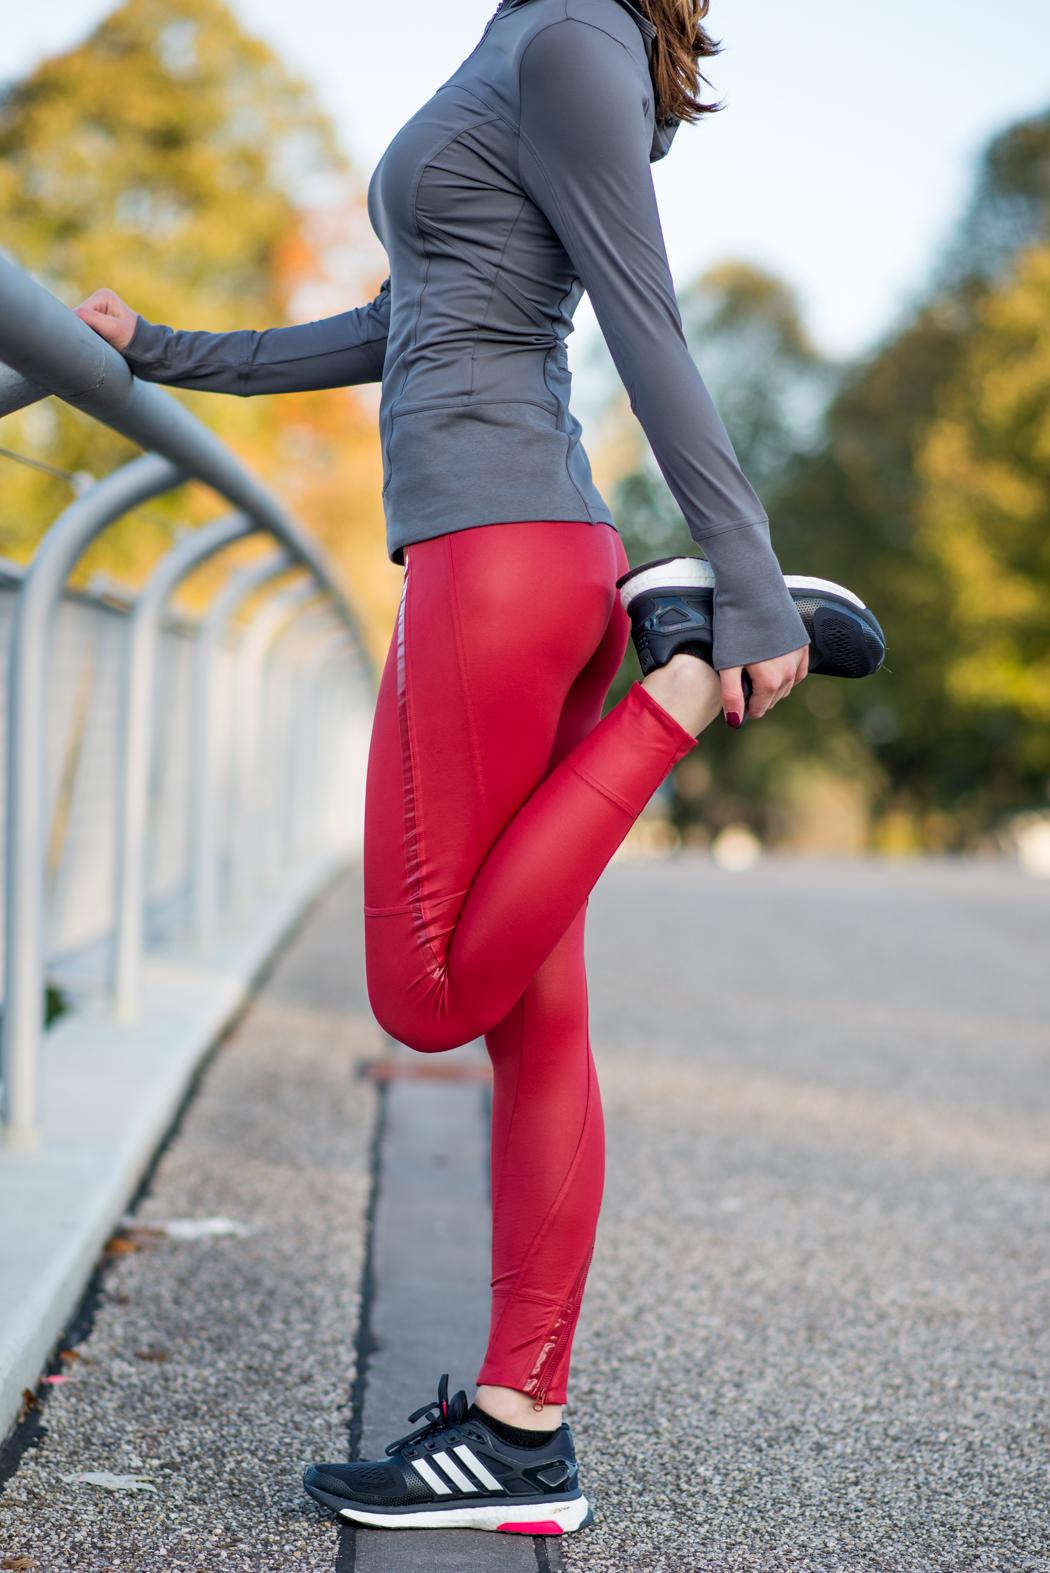 Red-Leatherpants-Stella-McCartney-Adidas-Running-5